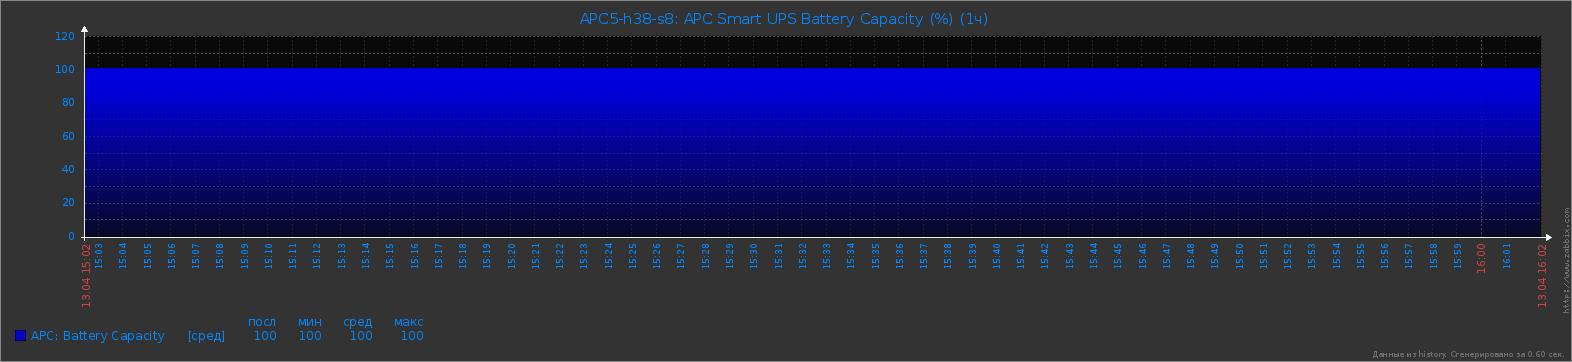 APC Smart UPS - Battery Capacity